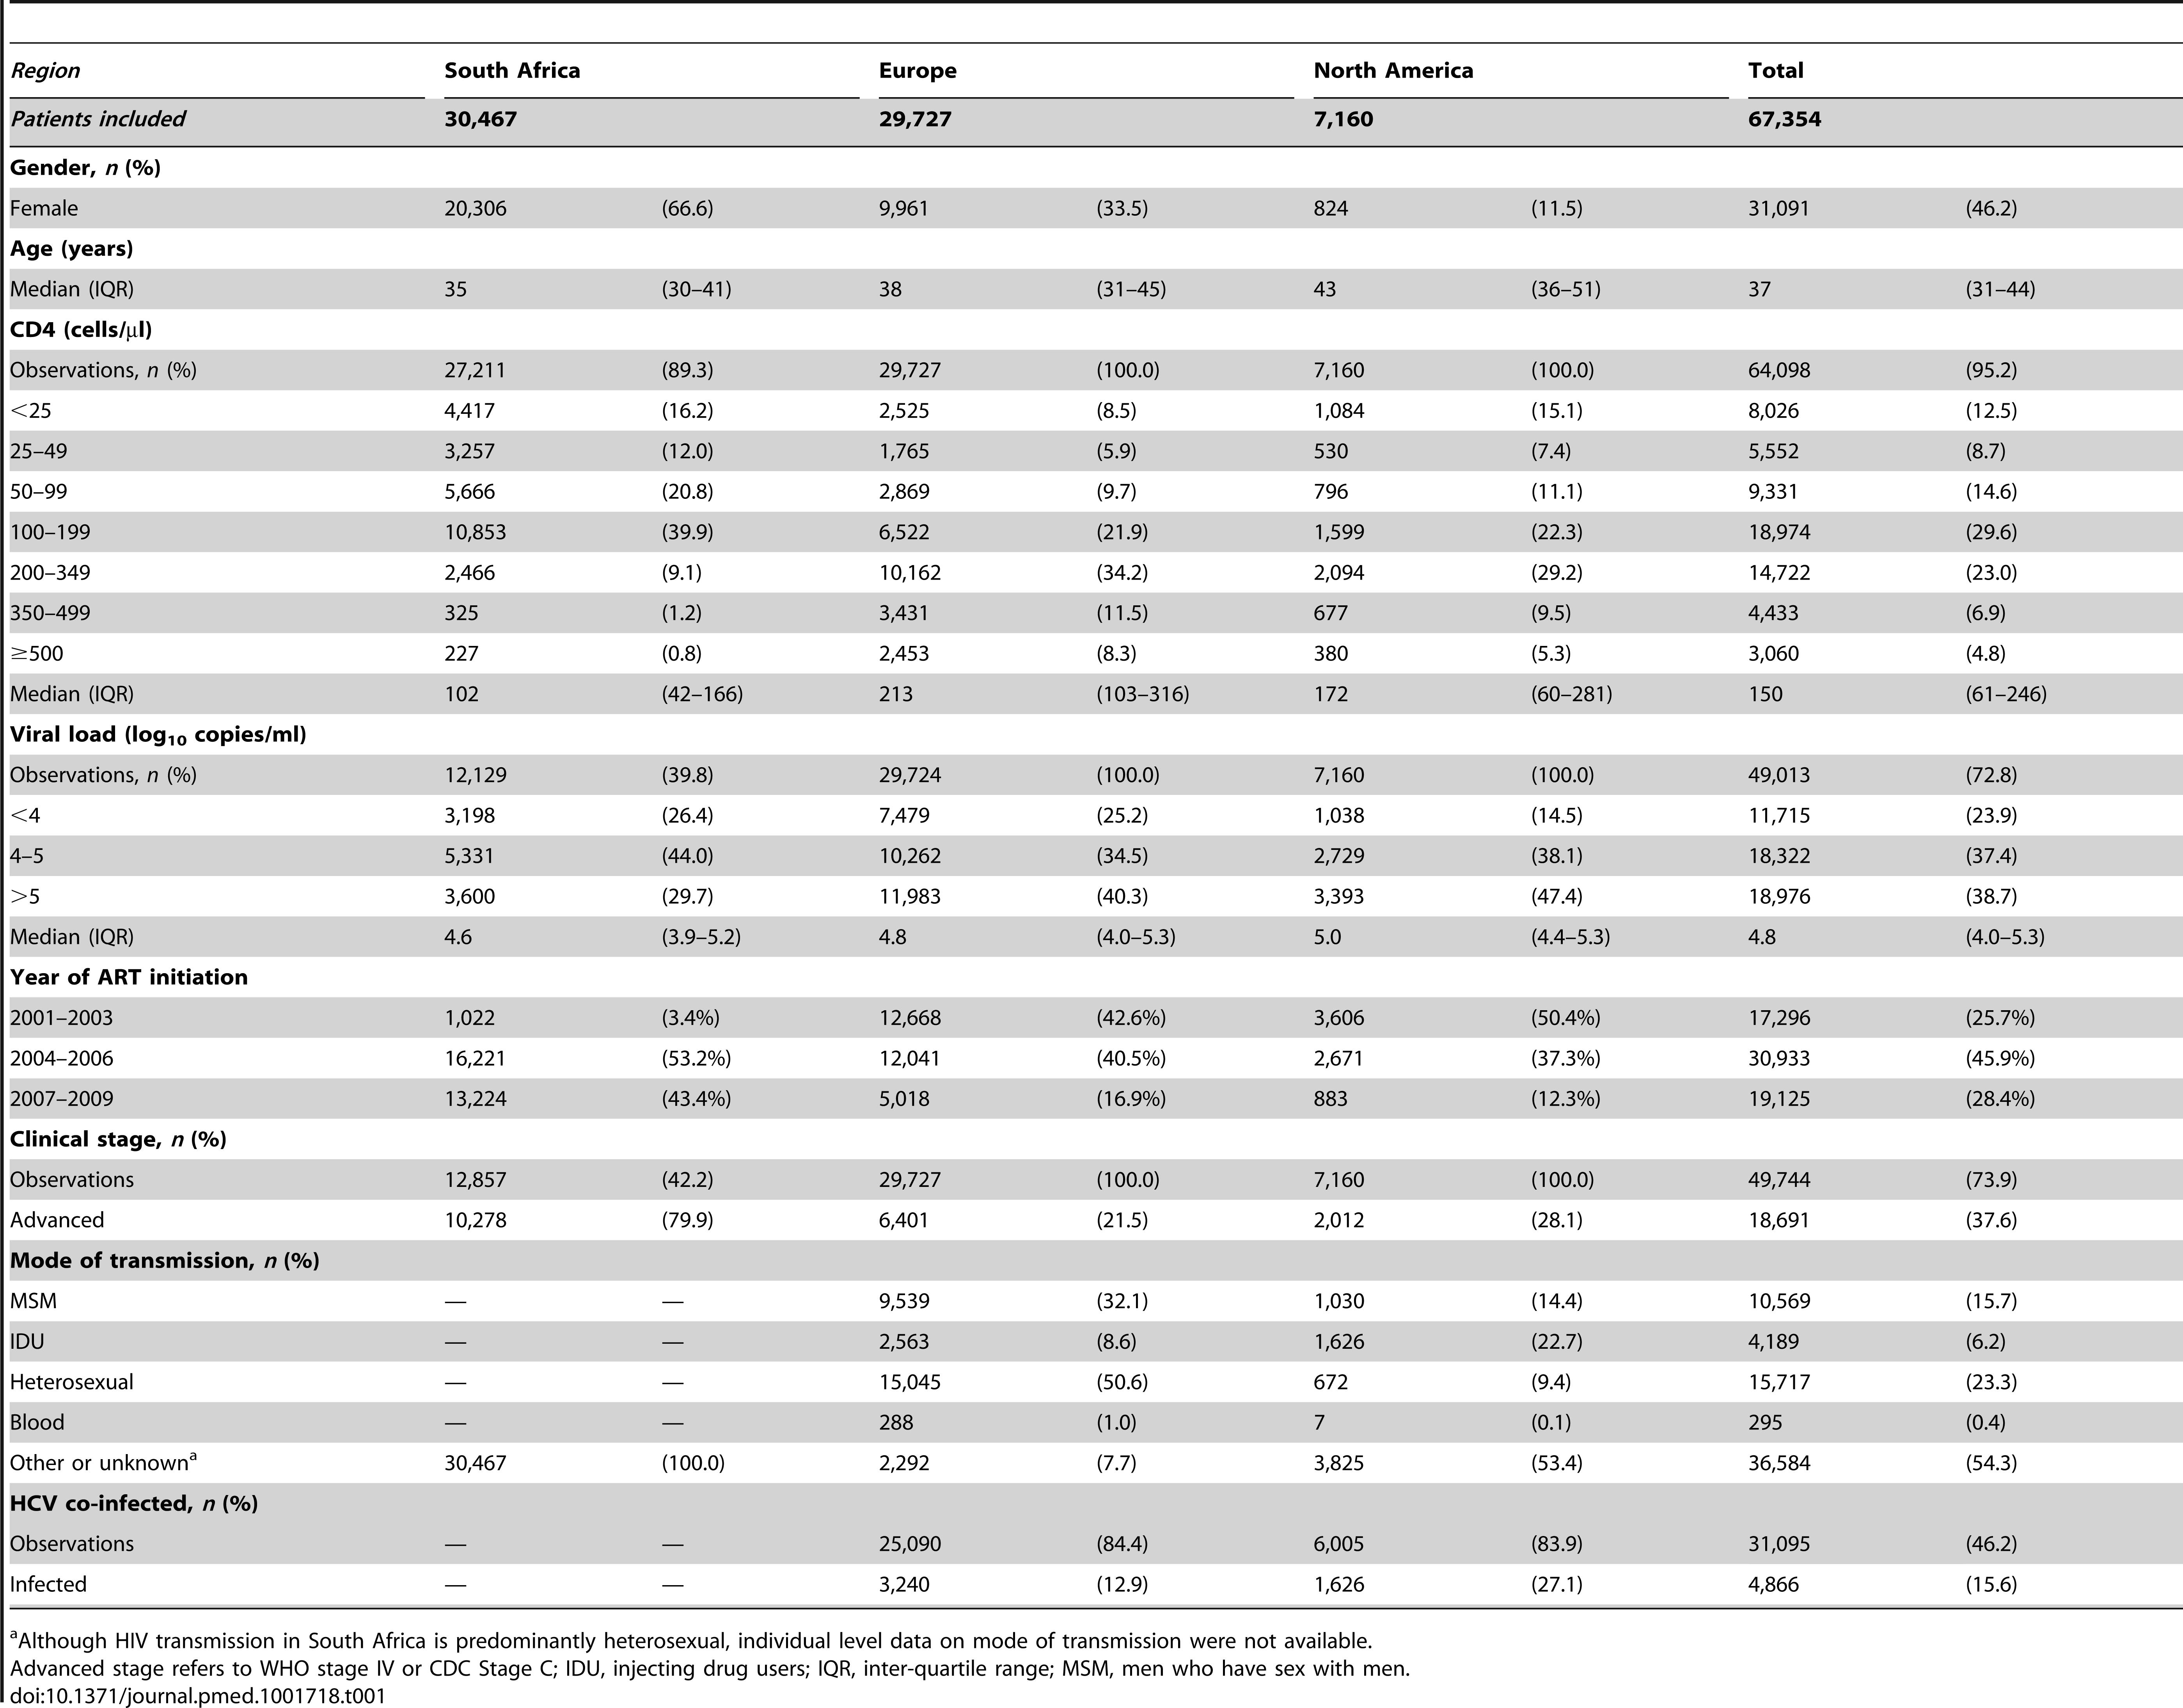 <b>Cohort characteristics at ART initiation for three regions, 2001–2009.</b>